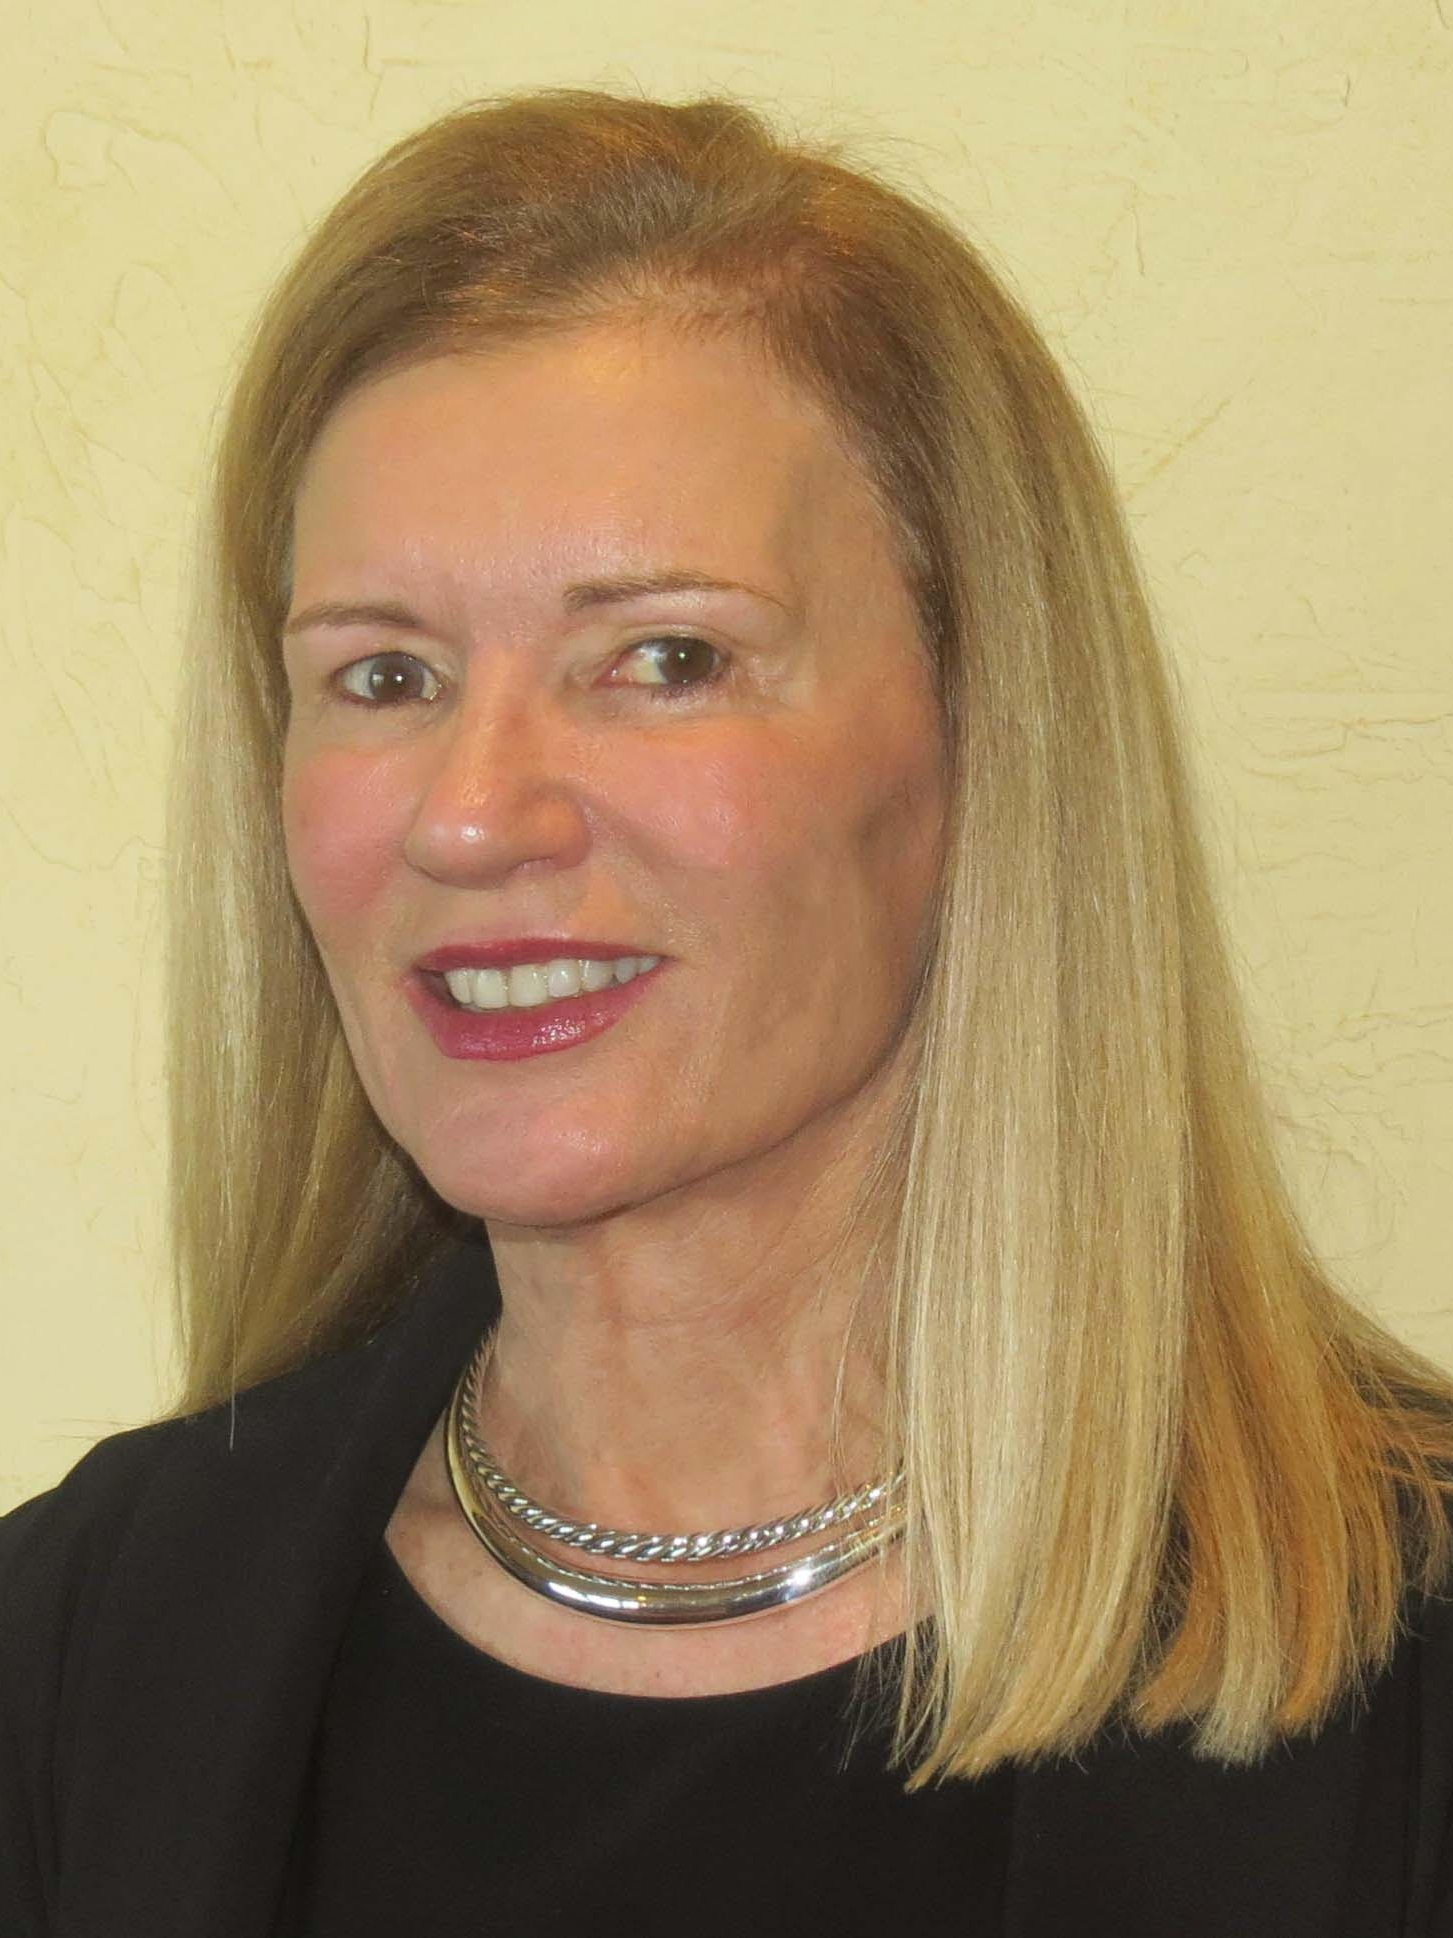 Sarah Kanne - GIBSON ISLAND CORPORATION